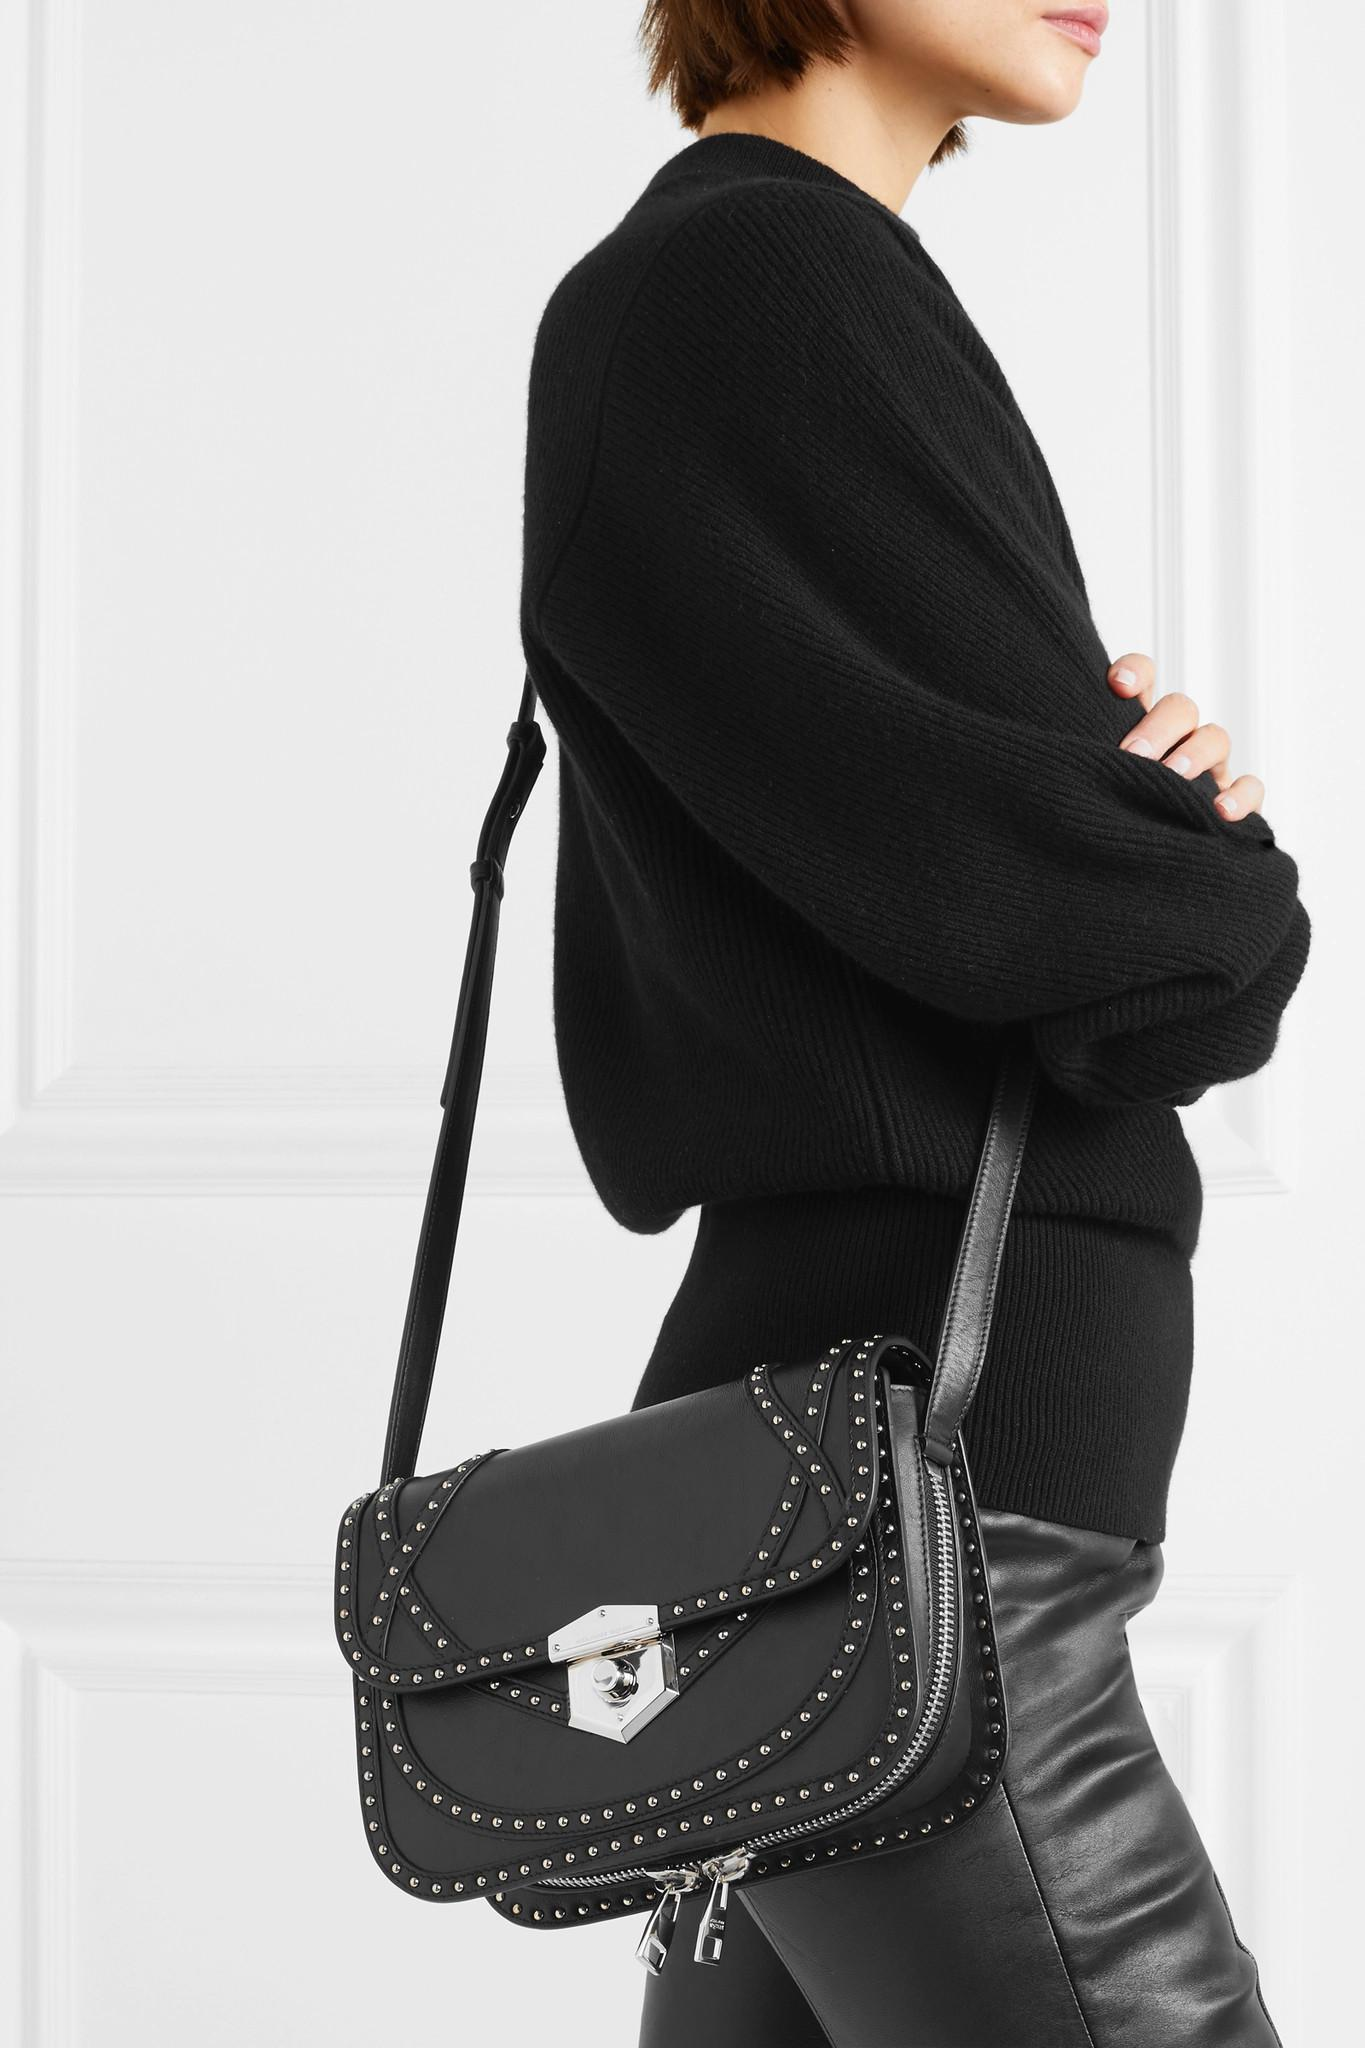 Lyst - Alexander McQueen Wicca Studded Textured-leather Shoulder Bag ... b1bded57da0f3